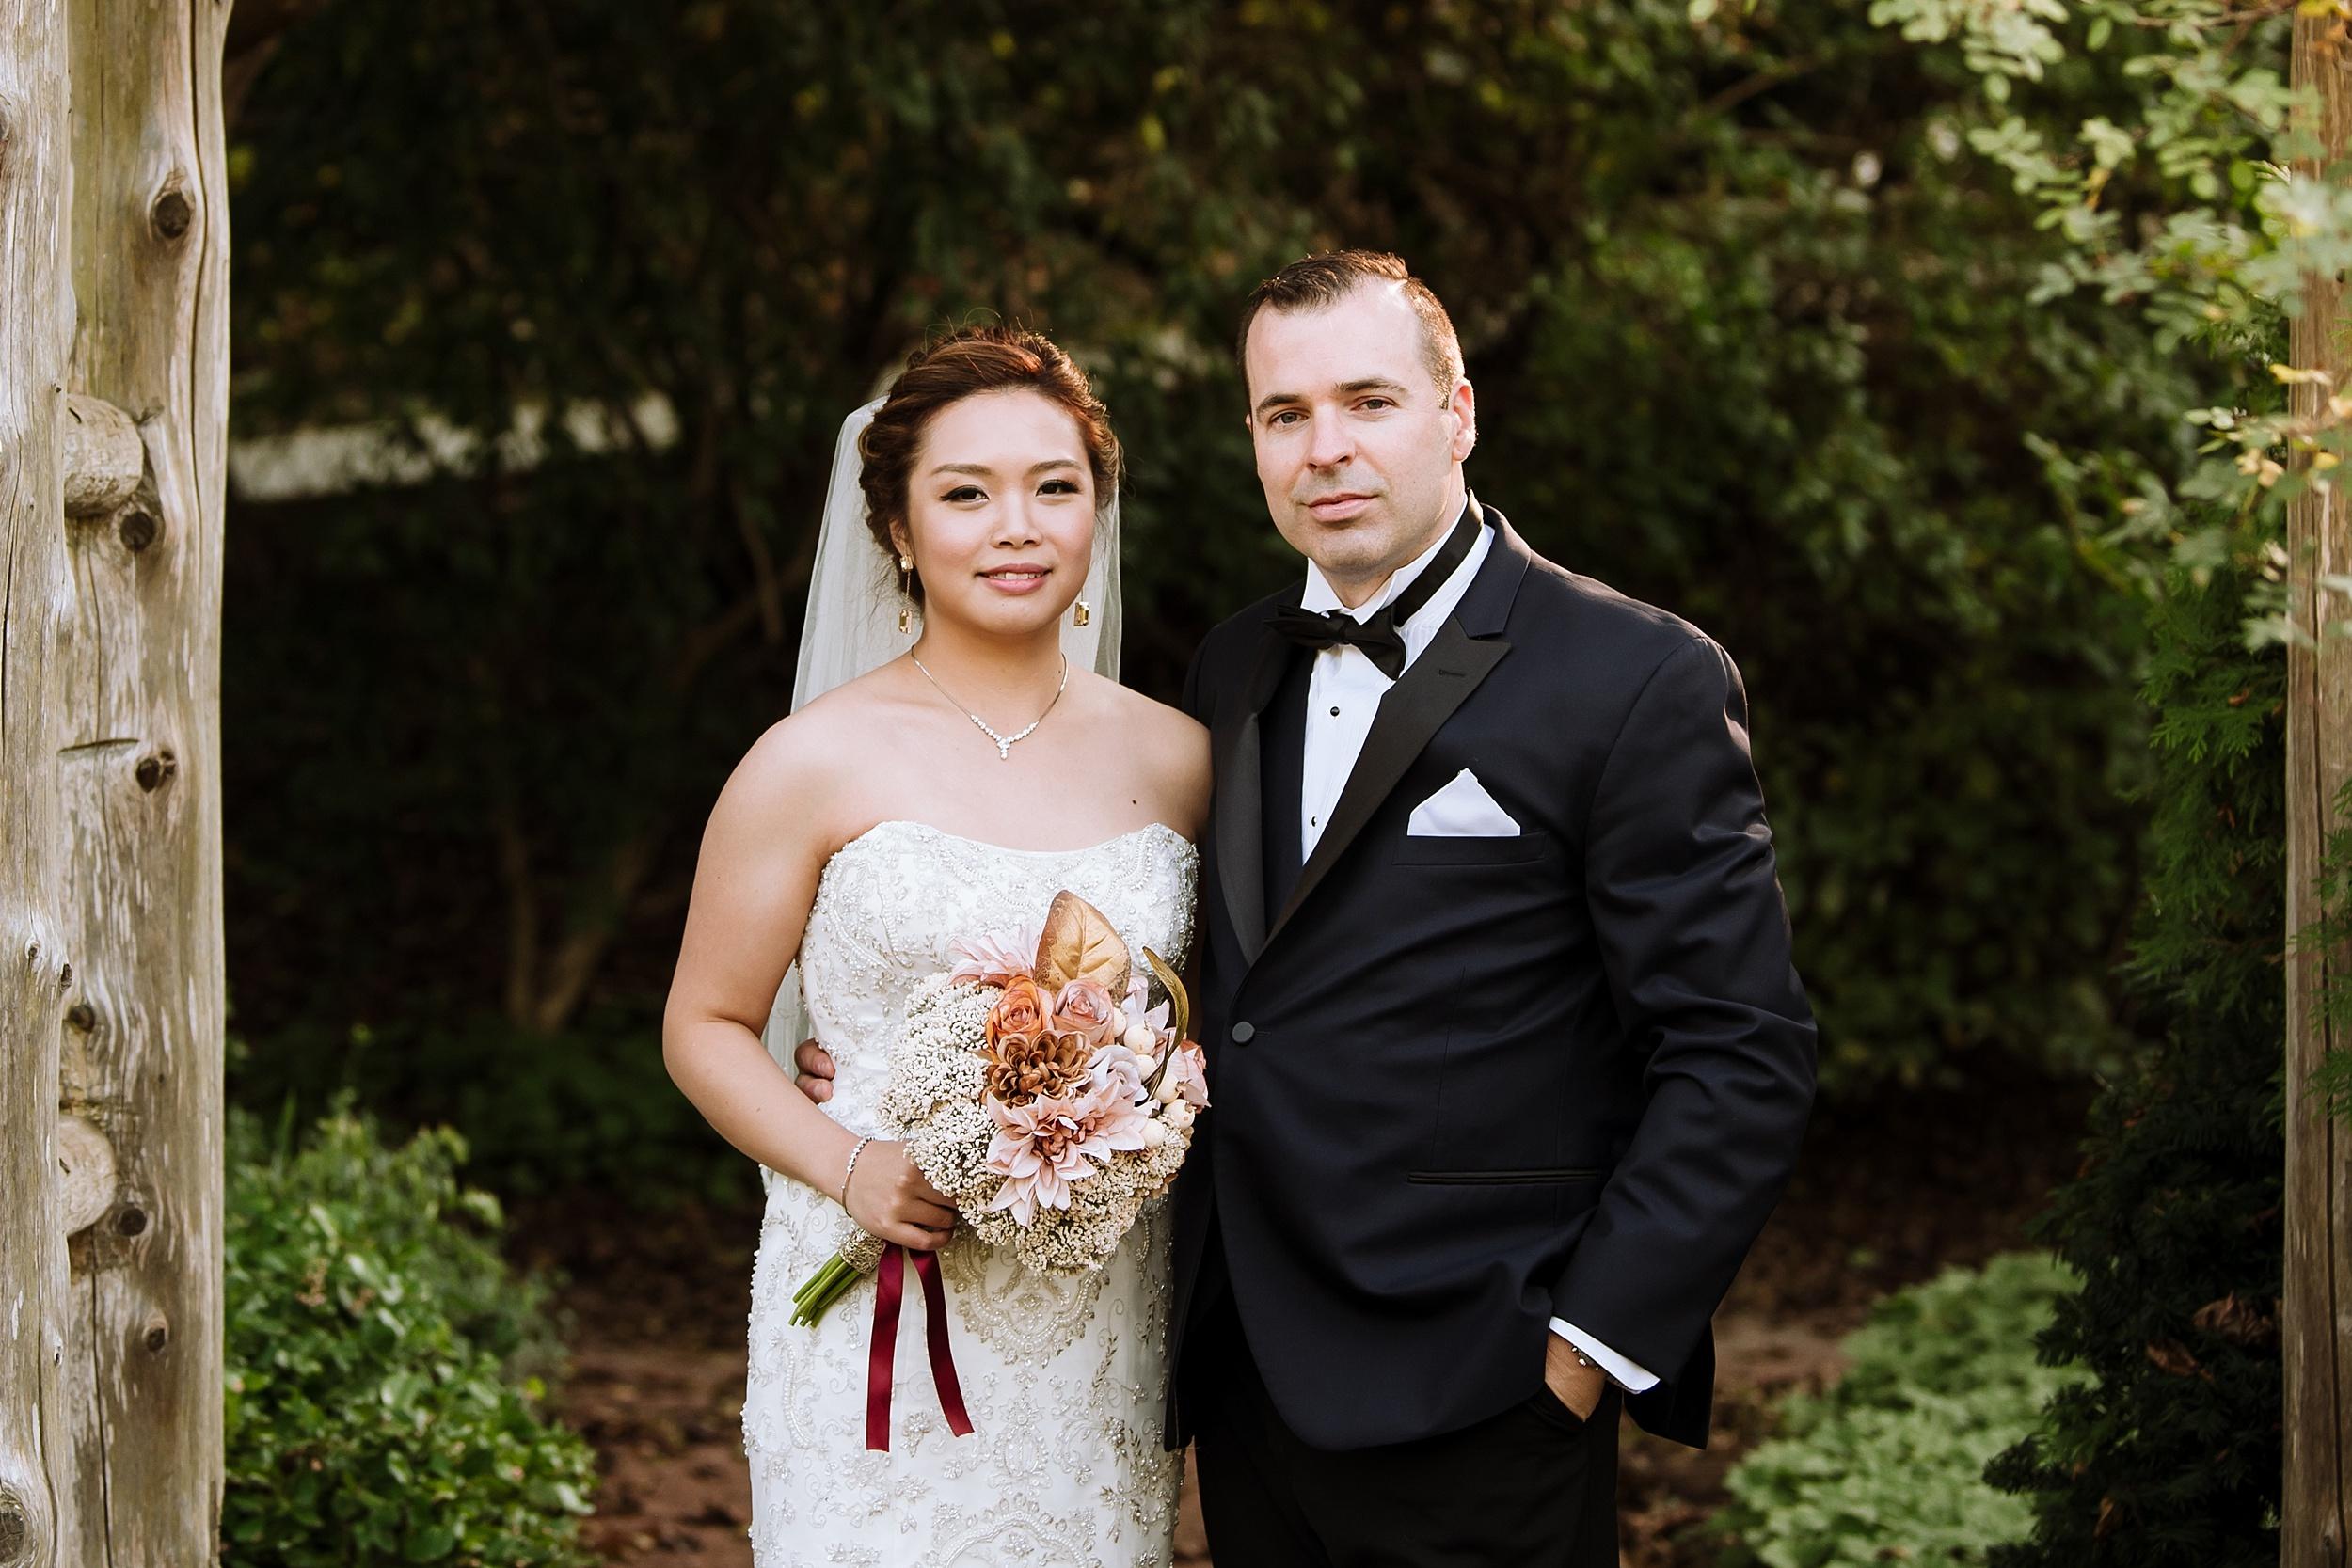 Sunnybrook_Estates_Alexander_Muir_Toronto_Wedding_Photographer_0007.jpg